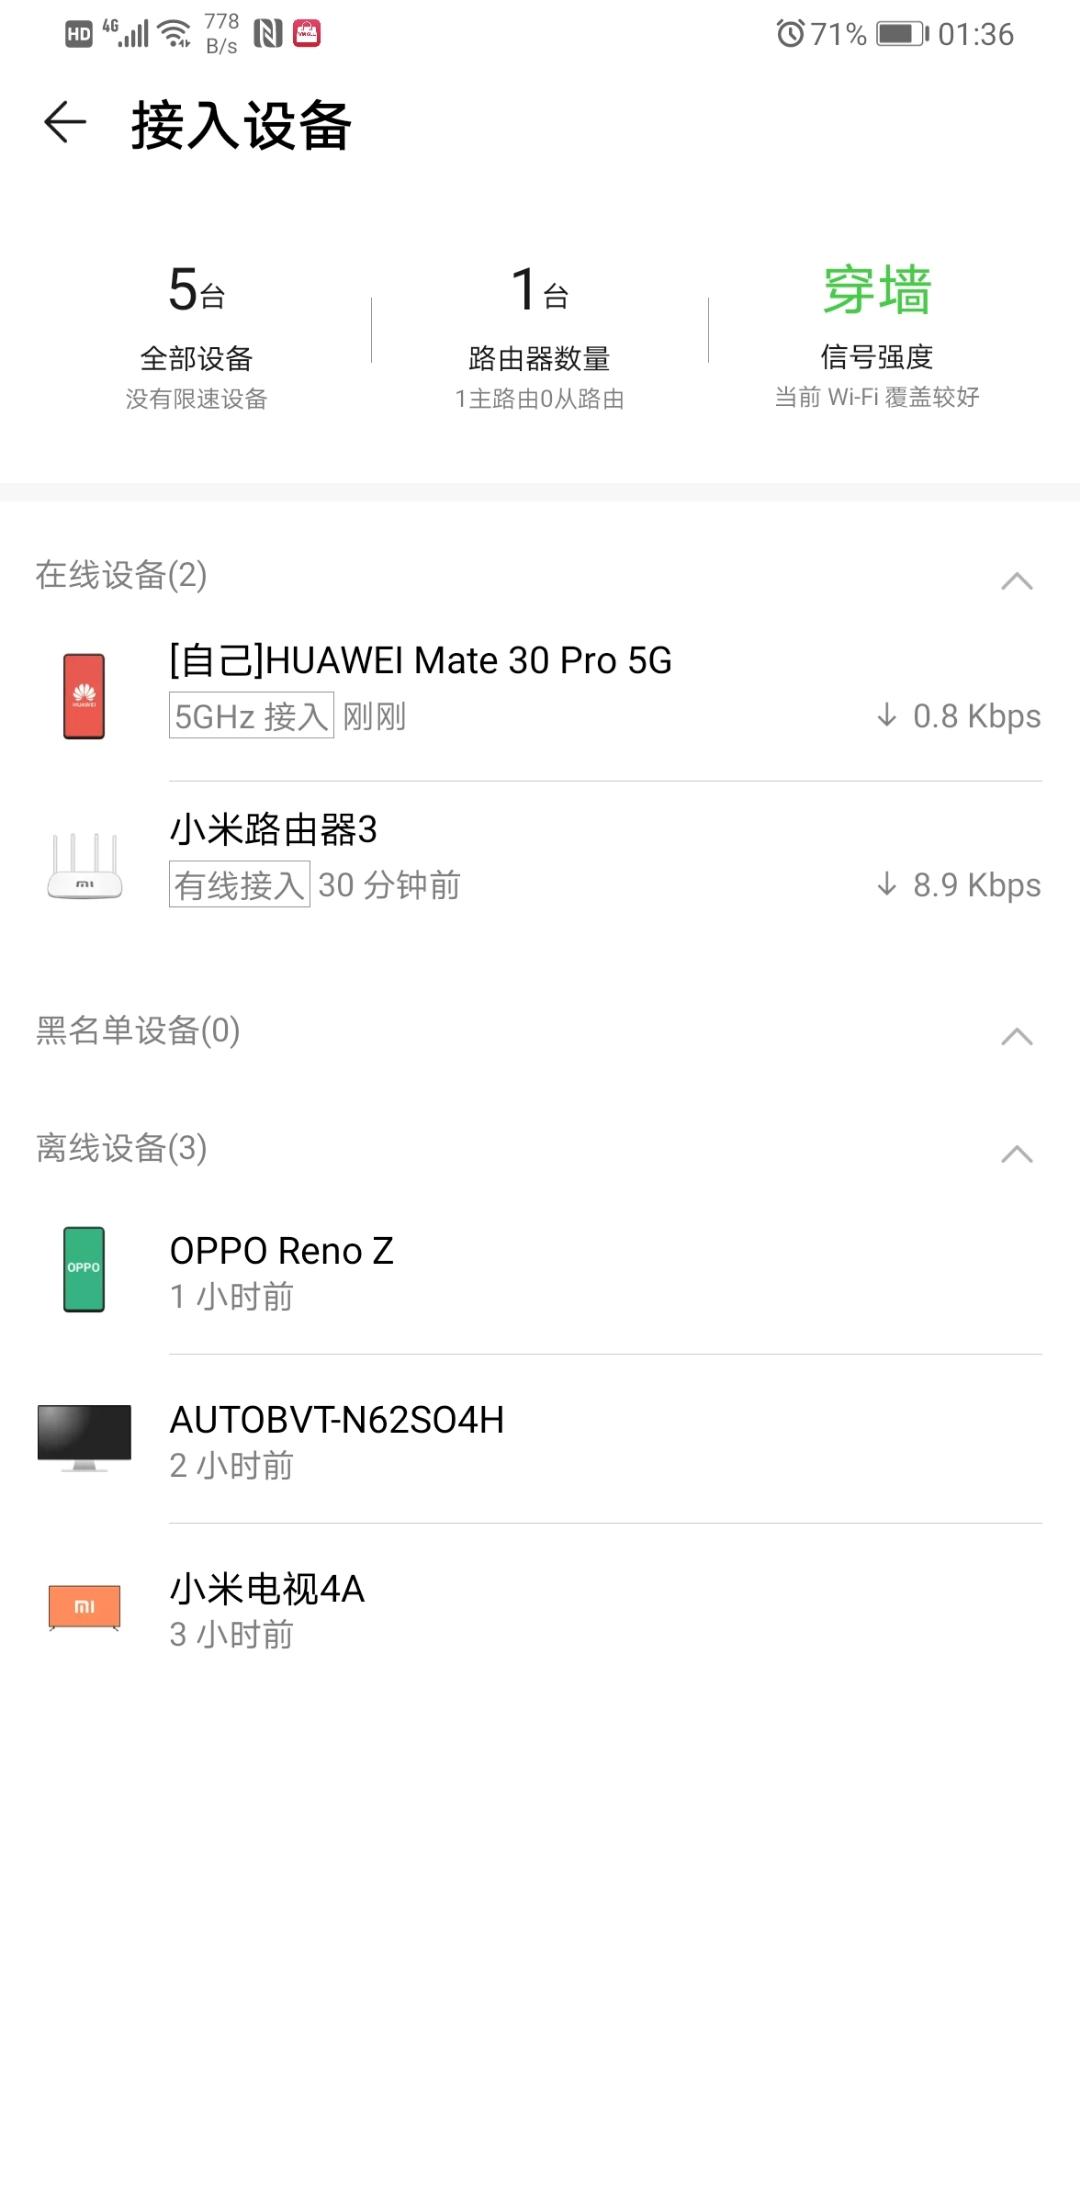 Screenshot_20200516_013636_com.huawei.smarthome.jpg